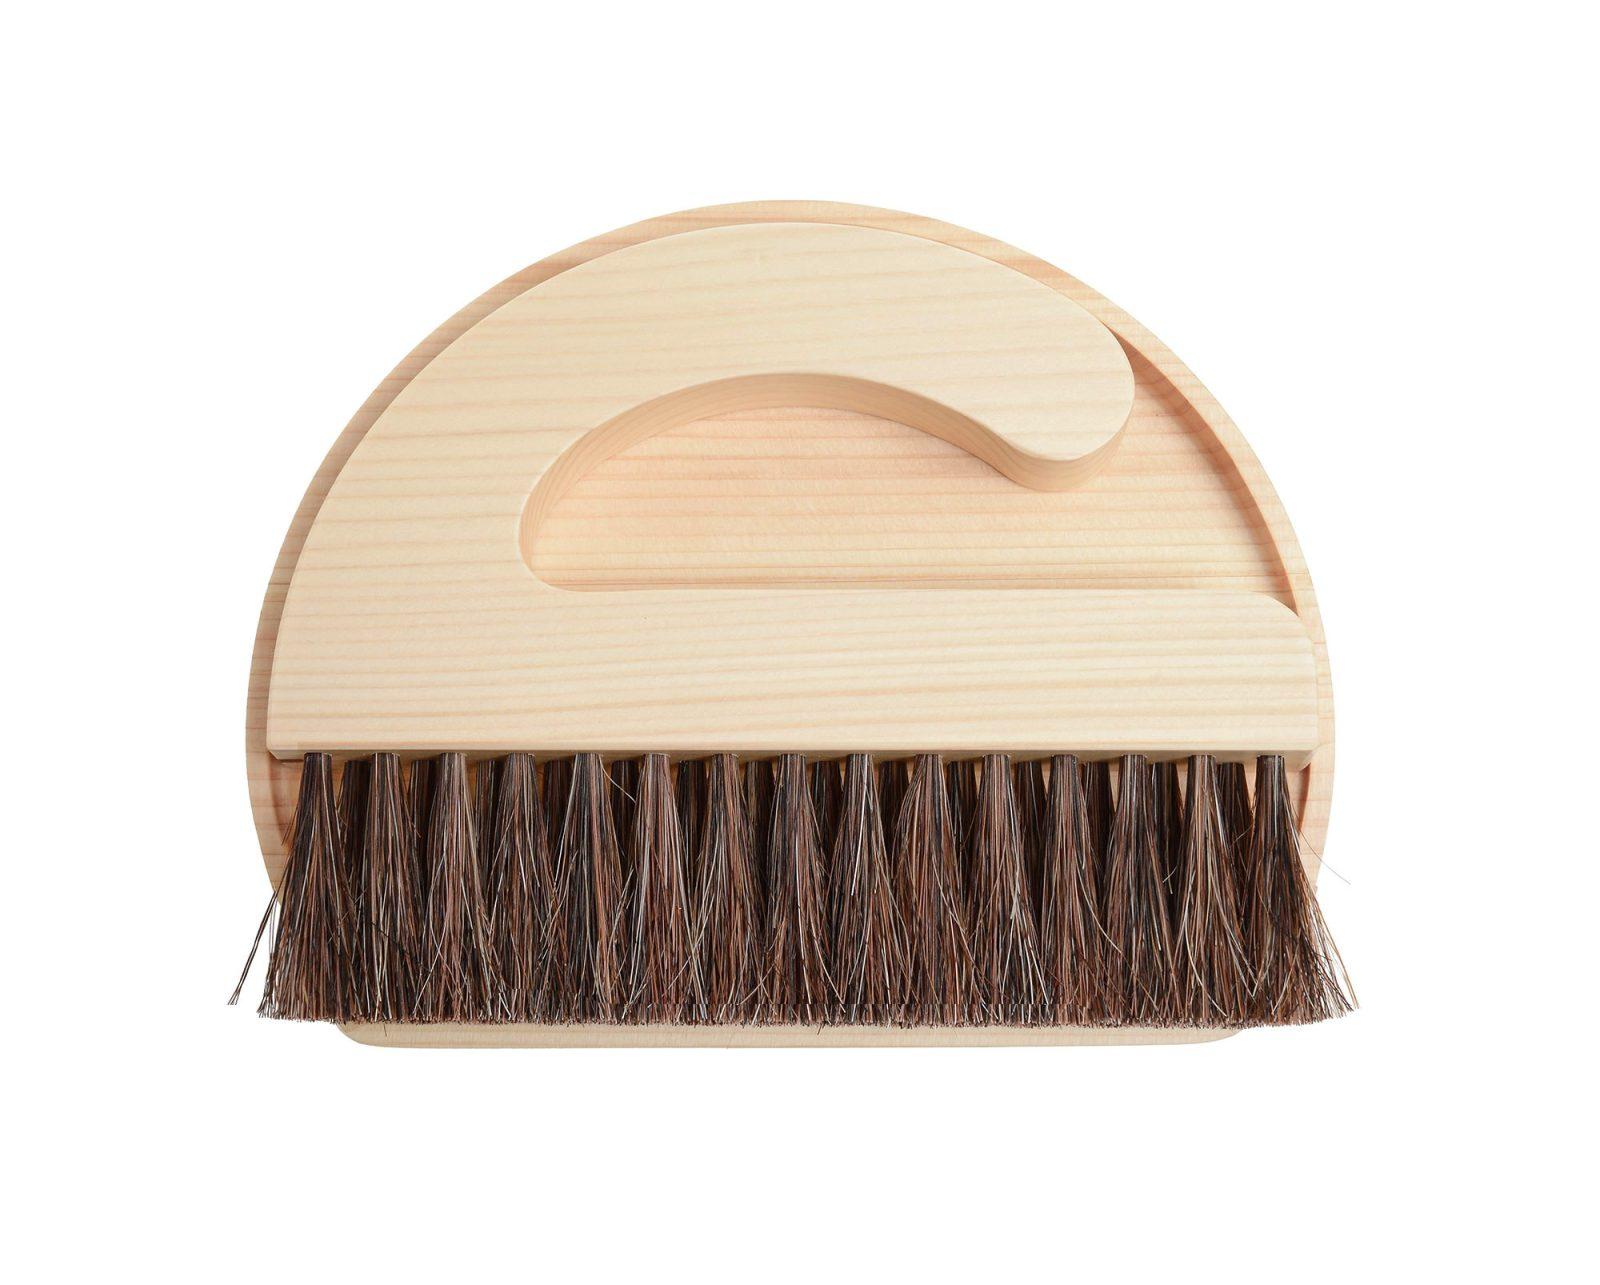 Asahineko Table Broom & Dust Pan by Makoto Koizumi-32832